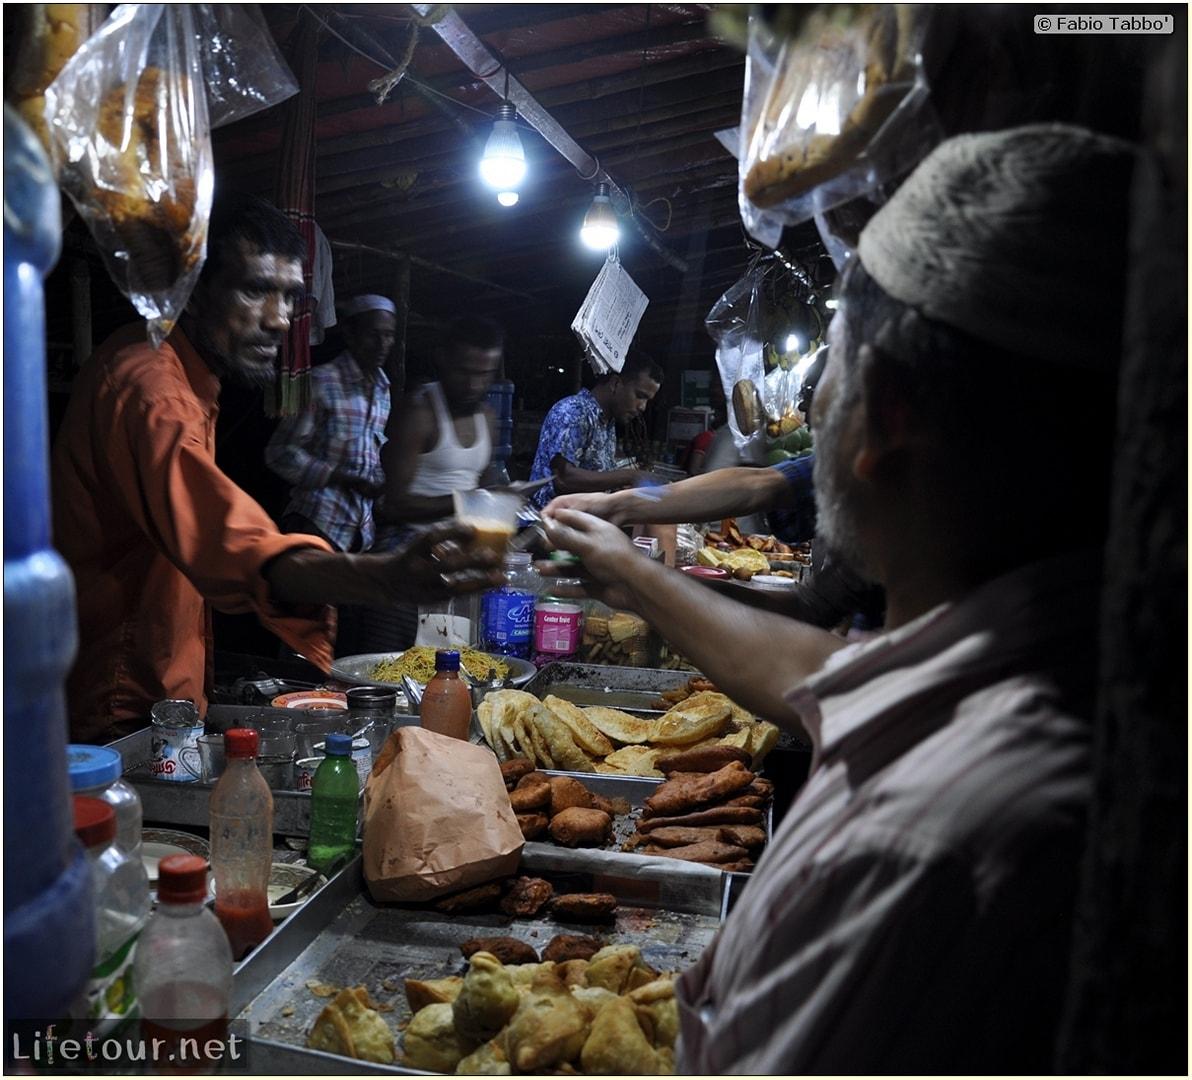 Fabios-LifeTour-Bangladesh-2014-May-Dacca-Night-markets-8286